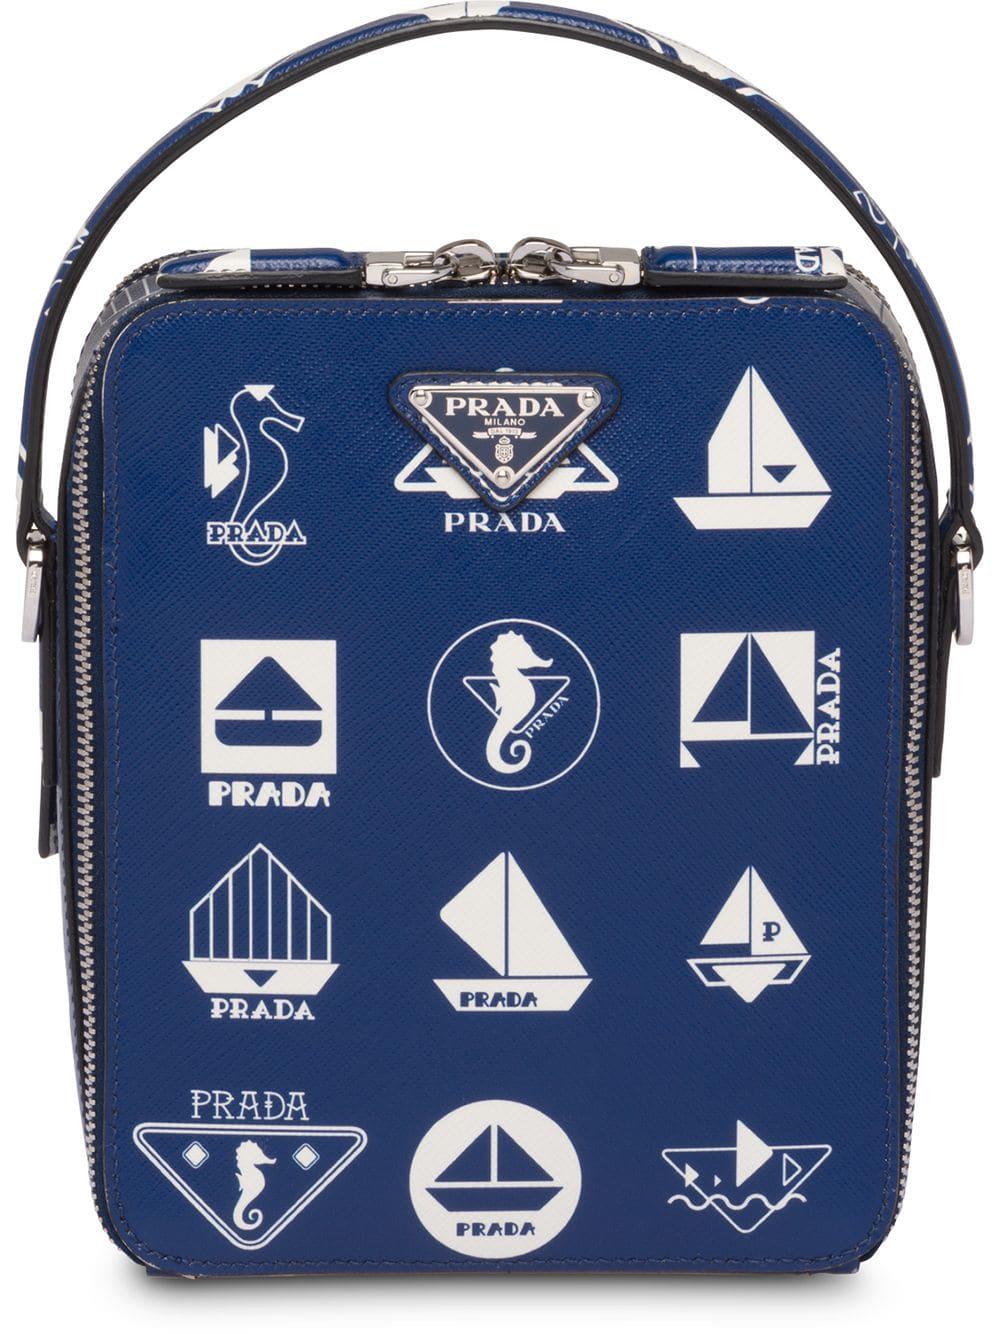 82ddfac59c02 Prada Brique Saffiano Bag - Blue